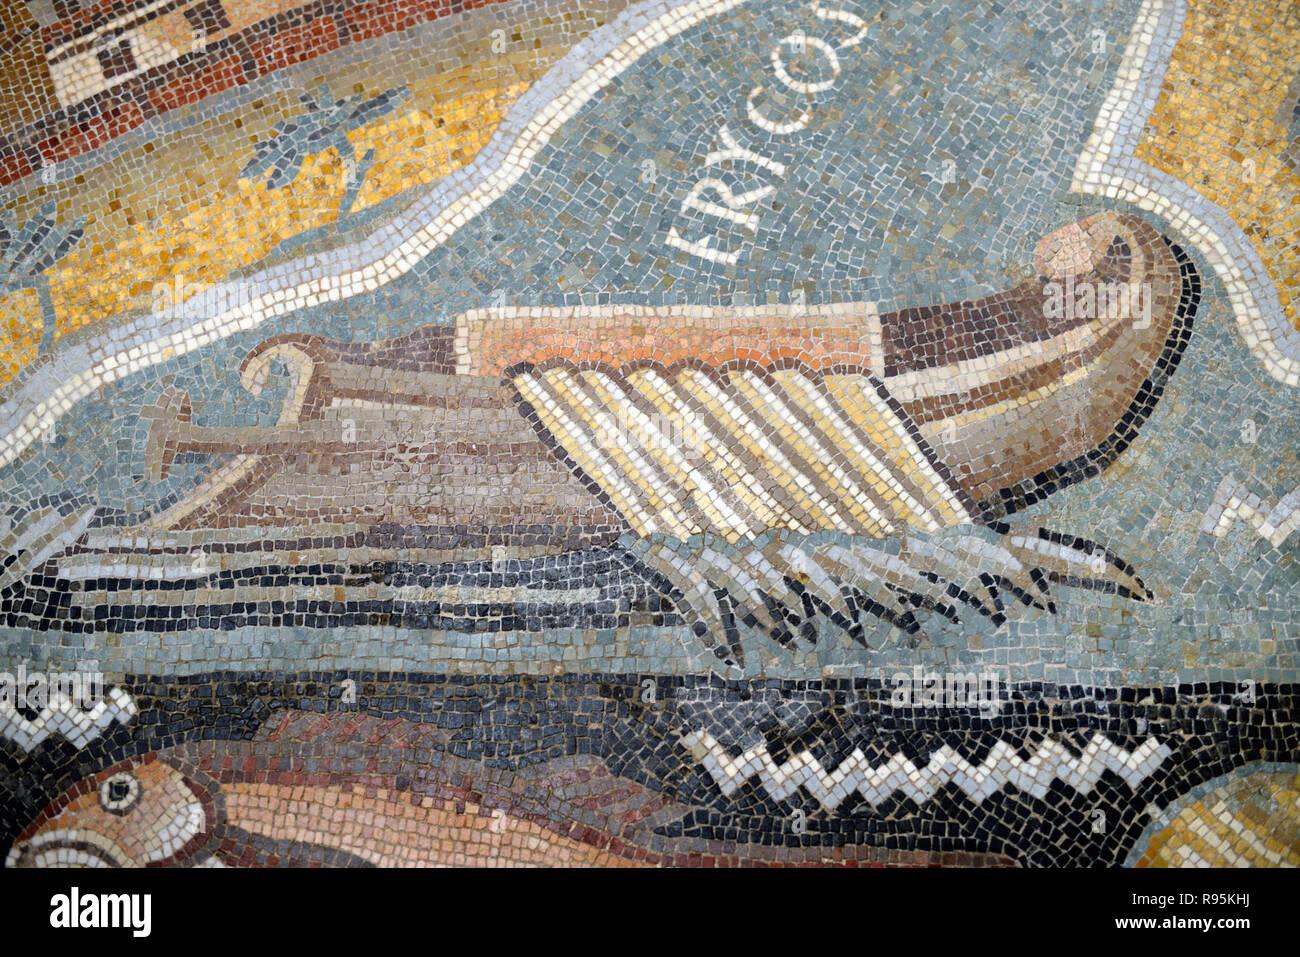 Roman Floor Mosaic (c3rd-c4th) of Roman Galley, Rowing Boat or Wooden Boat off Erice, Sicily, from Ancient Roman City of Ammaedara Haidra Tunisia - Stock Image